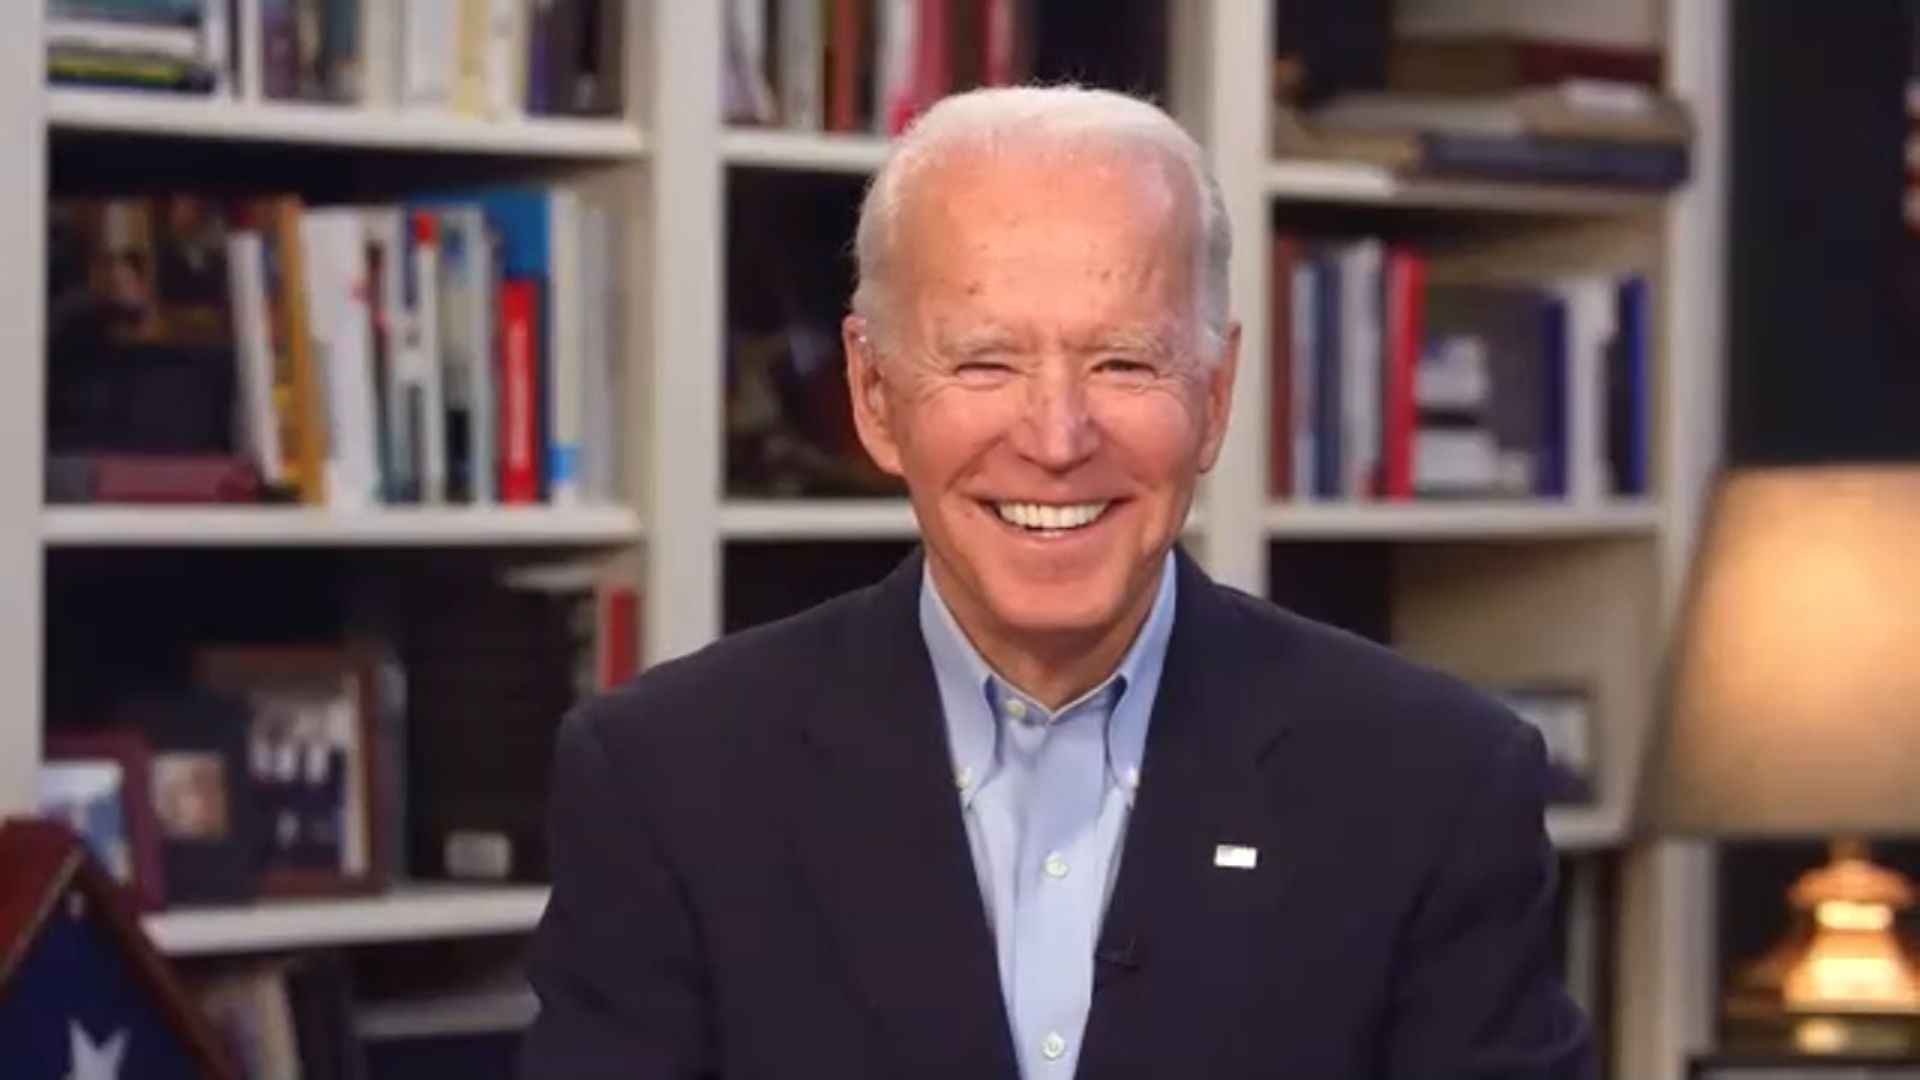 Joe Biden to speak virtually at Texas Democratic Party convention